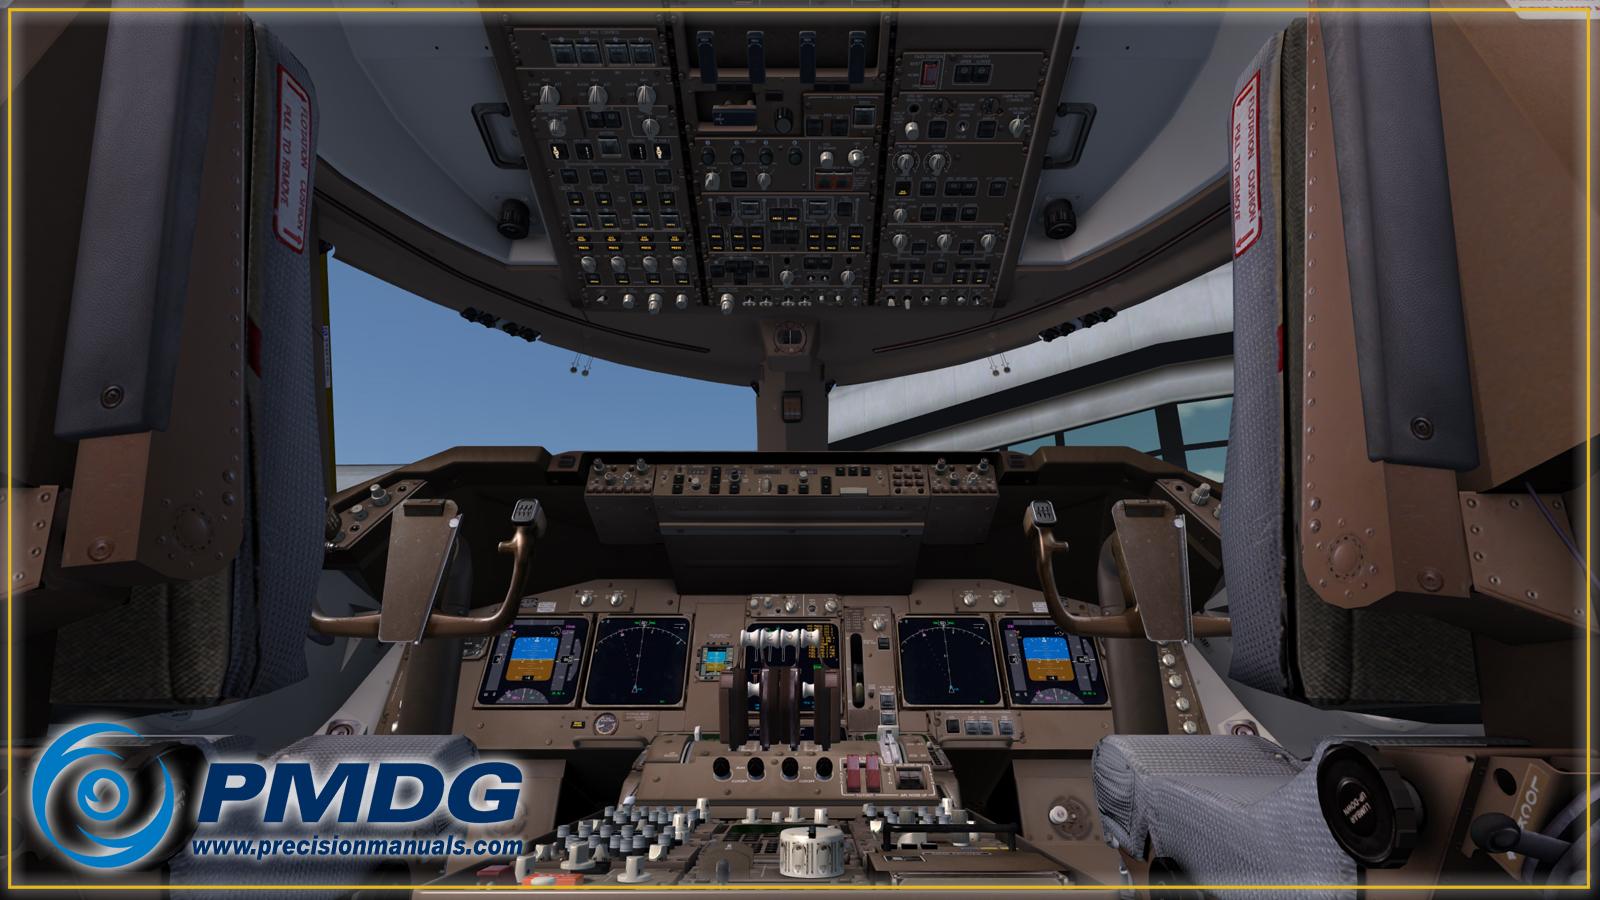 PMDG_744vc2.jpg